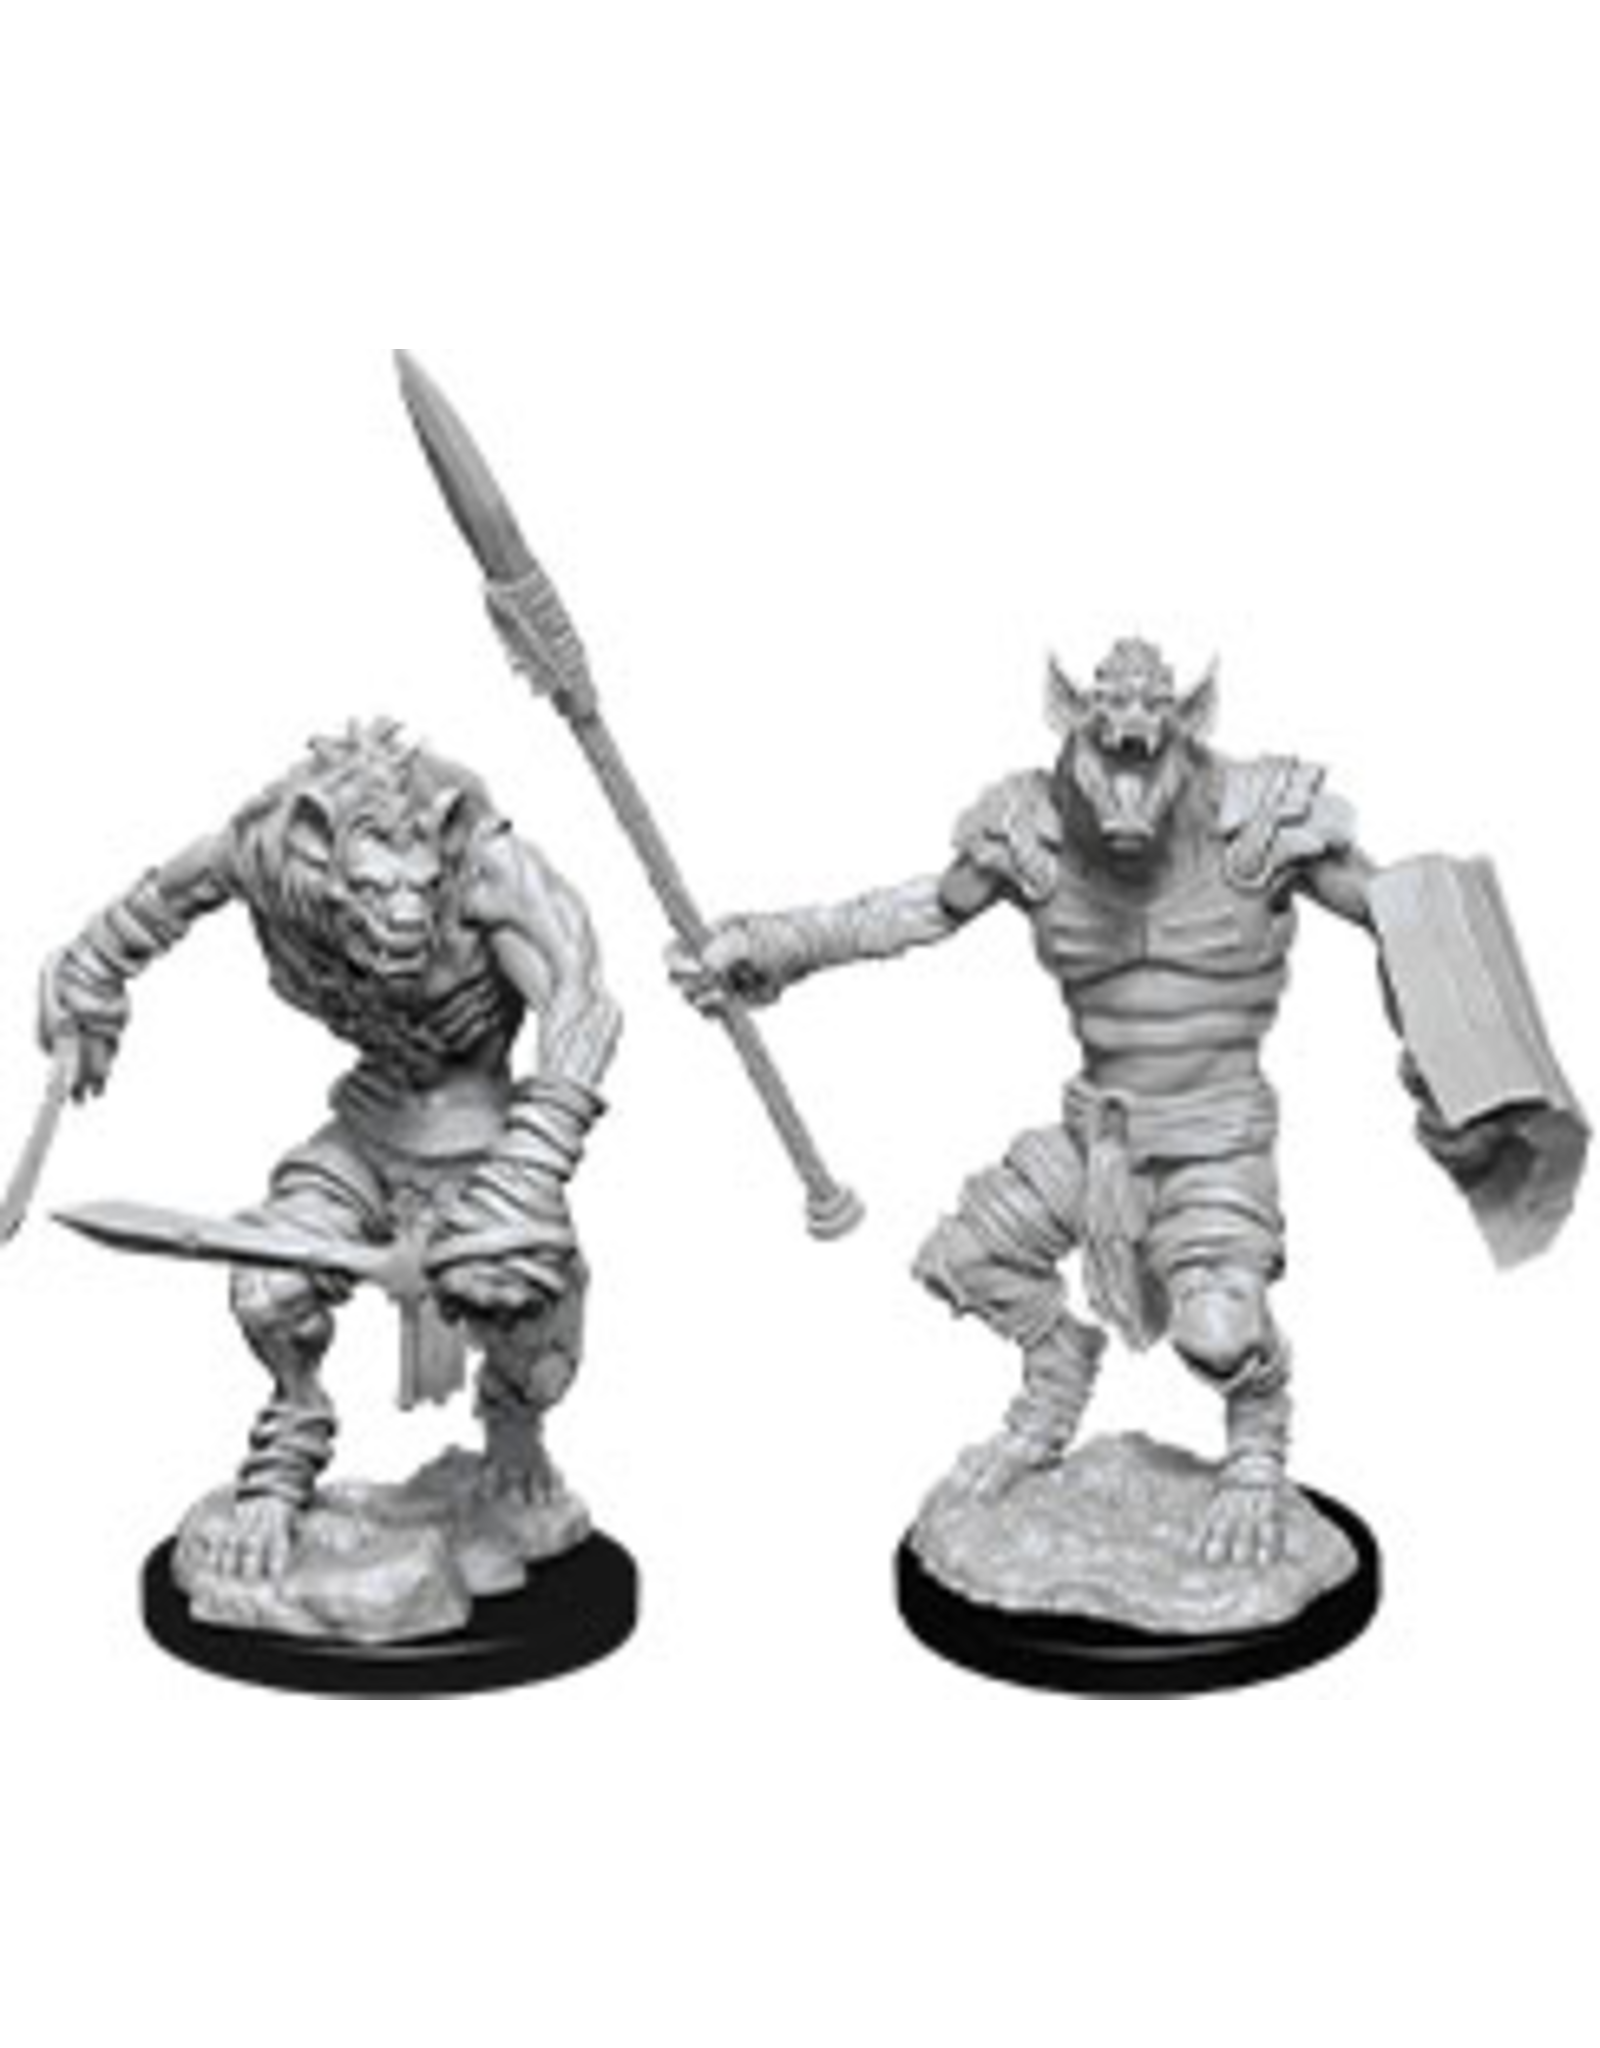 WizKids D&D Minis (unpainted): Gnoll & Gnoll Flesh Gnawer Wave 12, 90066